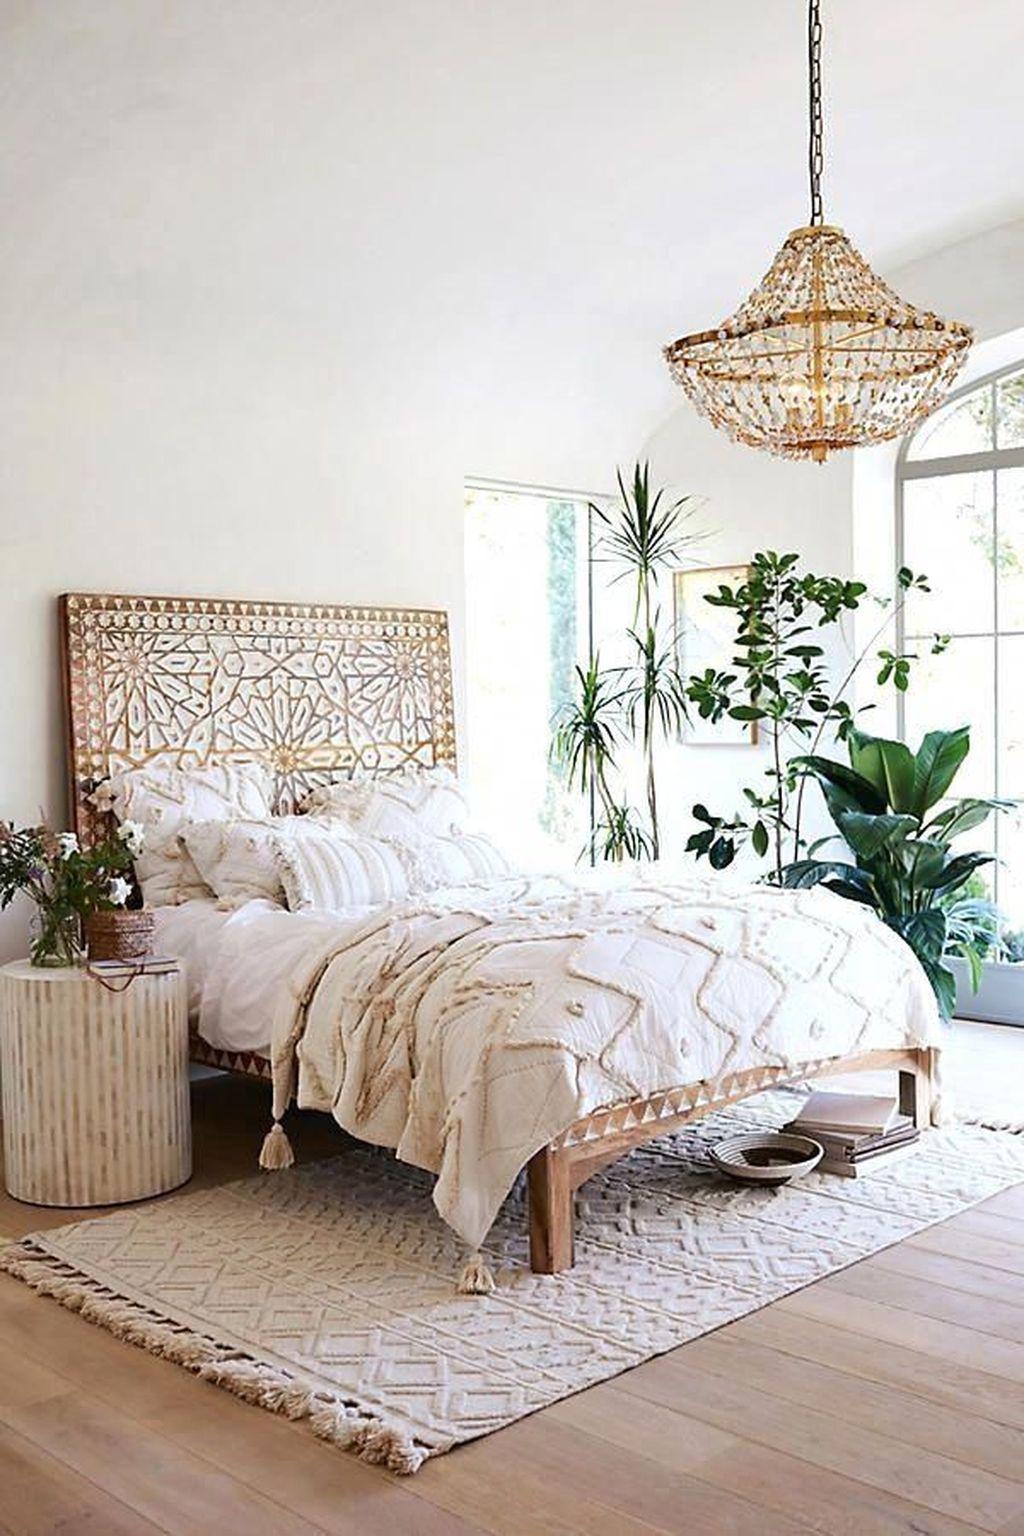 Awesome Boho Chic Bedroom Decor Ideas 23